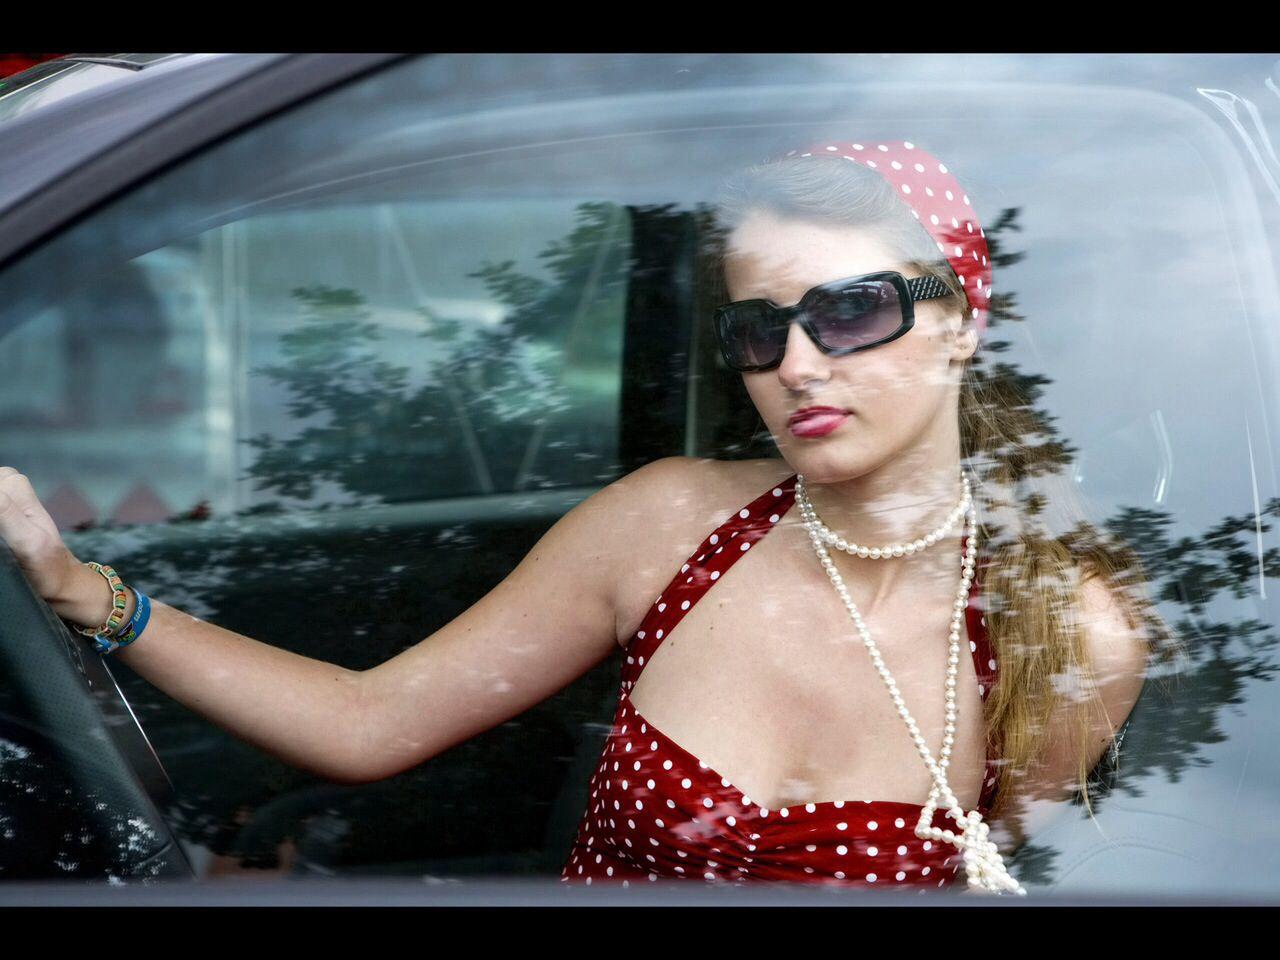 Car window